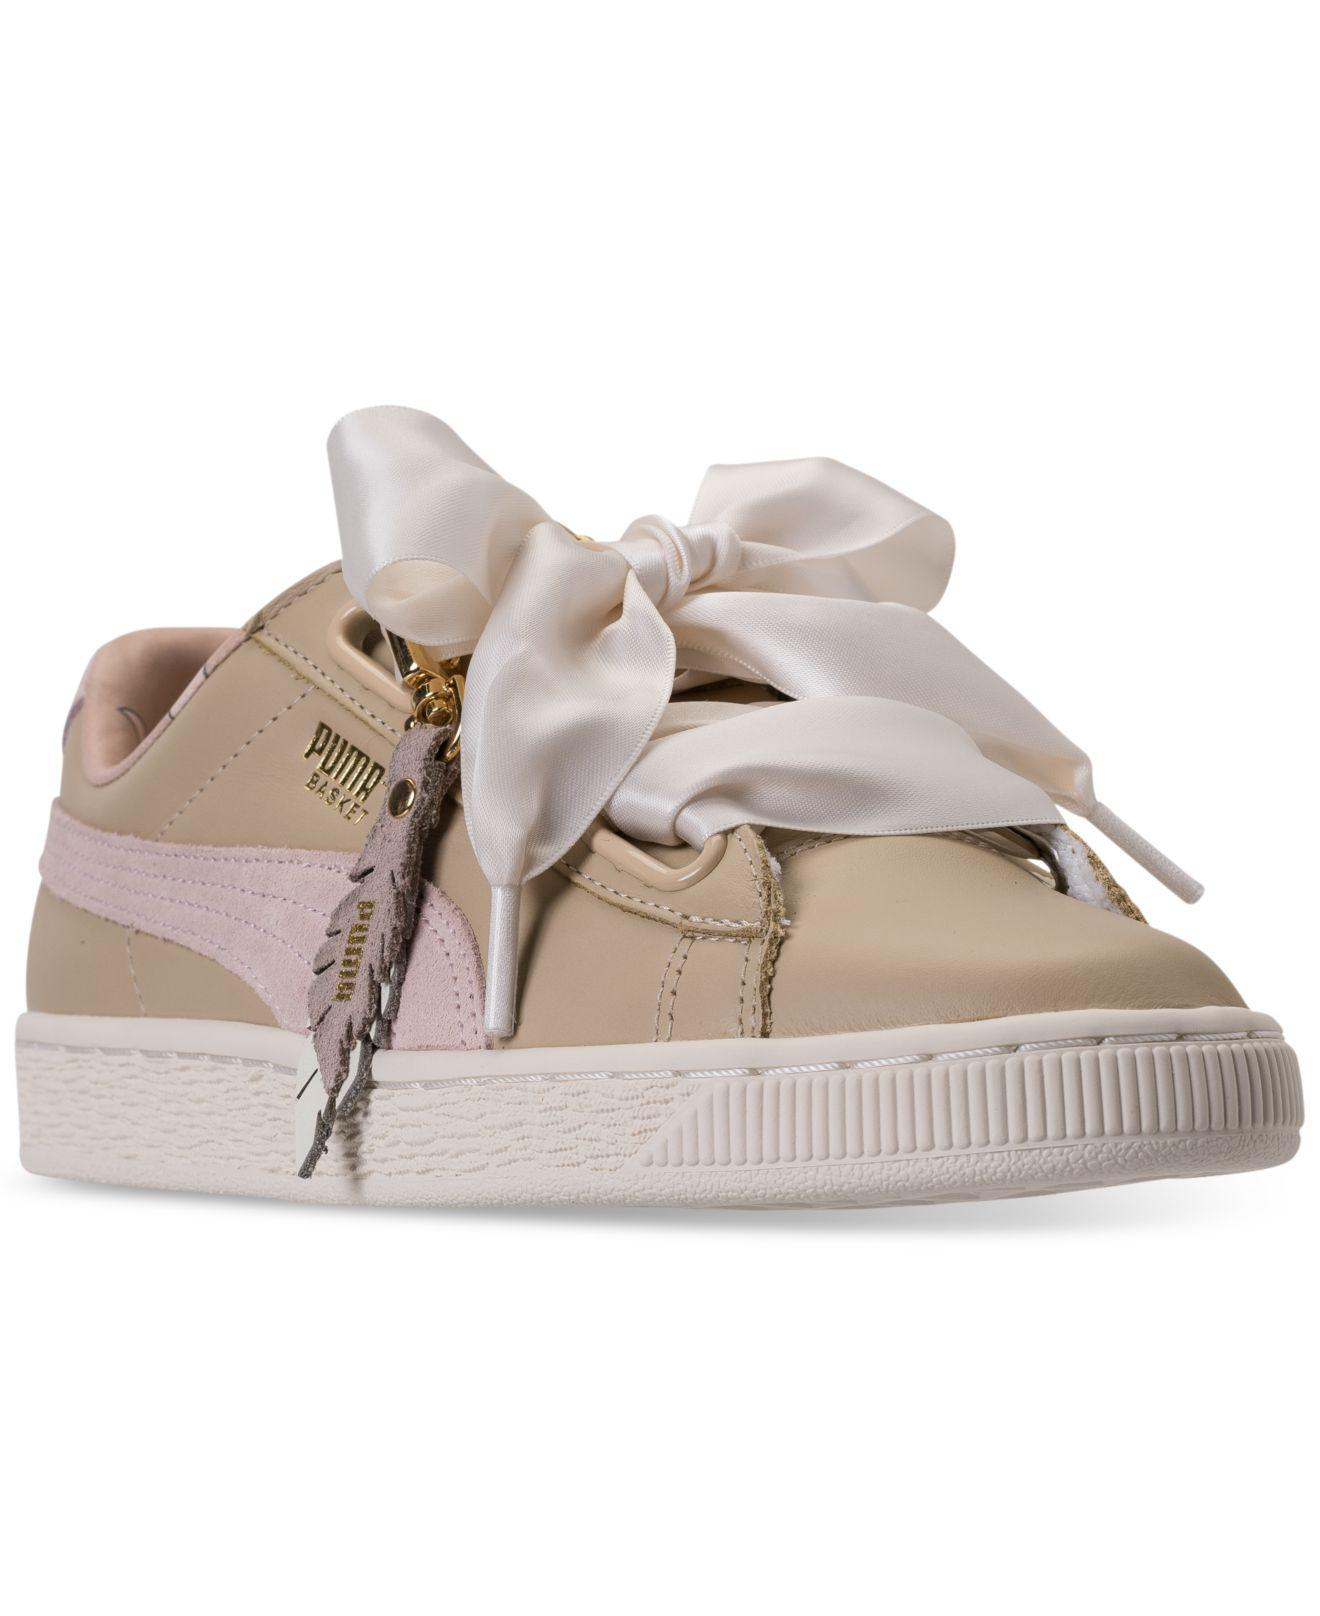 3fe038e089a ... canada discount lyst puma basket heart coach casual sneakers from  finish line c3898 115d0 f9b27 5ff7d